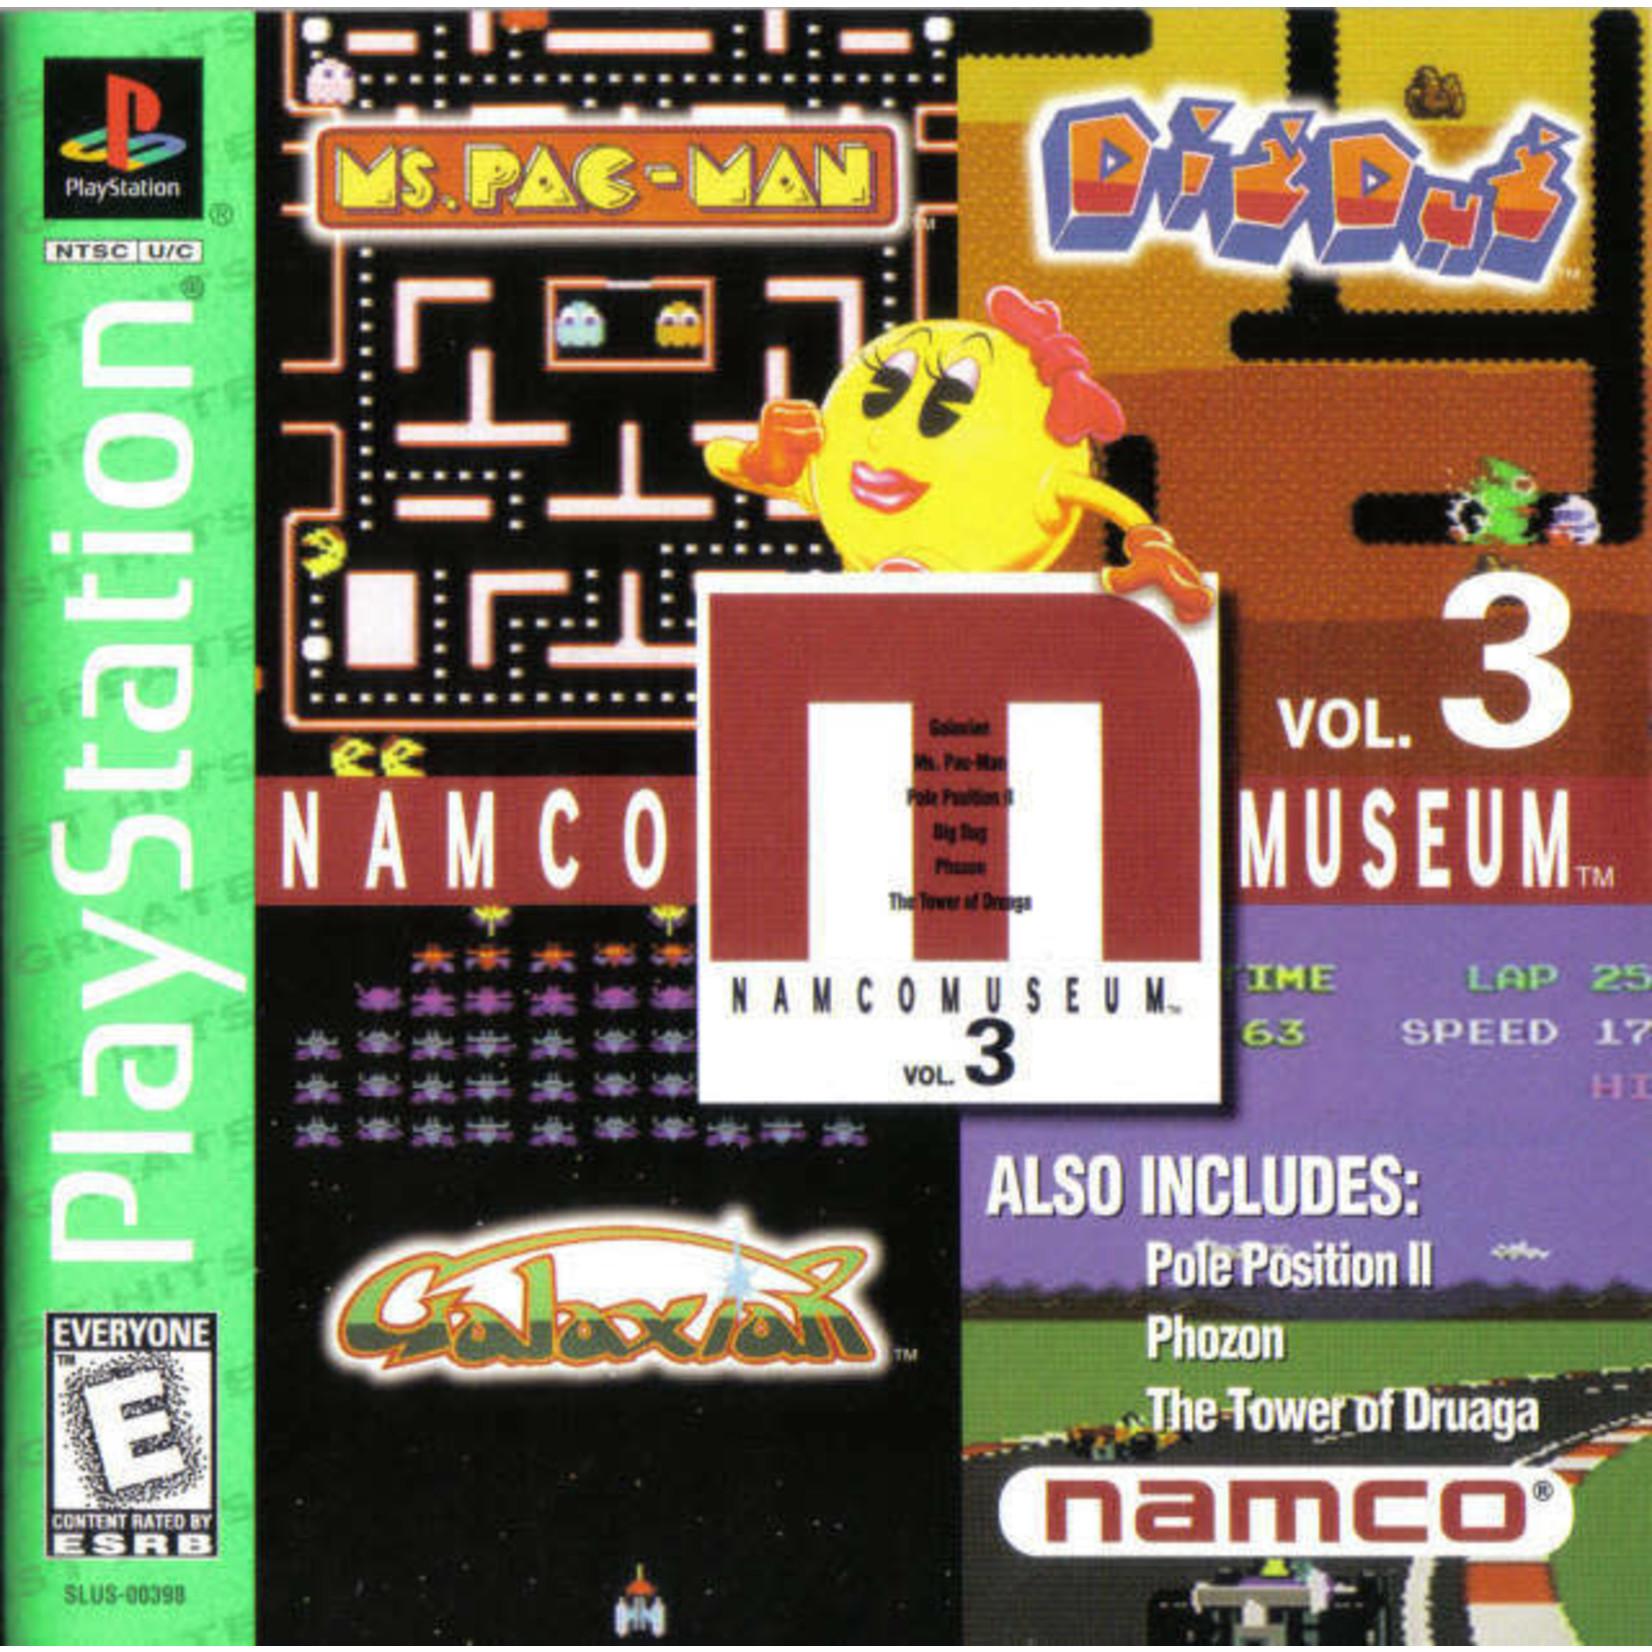 ps1u-Namco Museum Volume 3